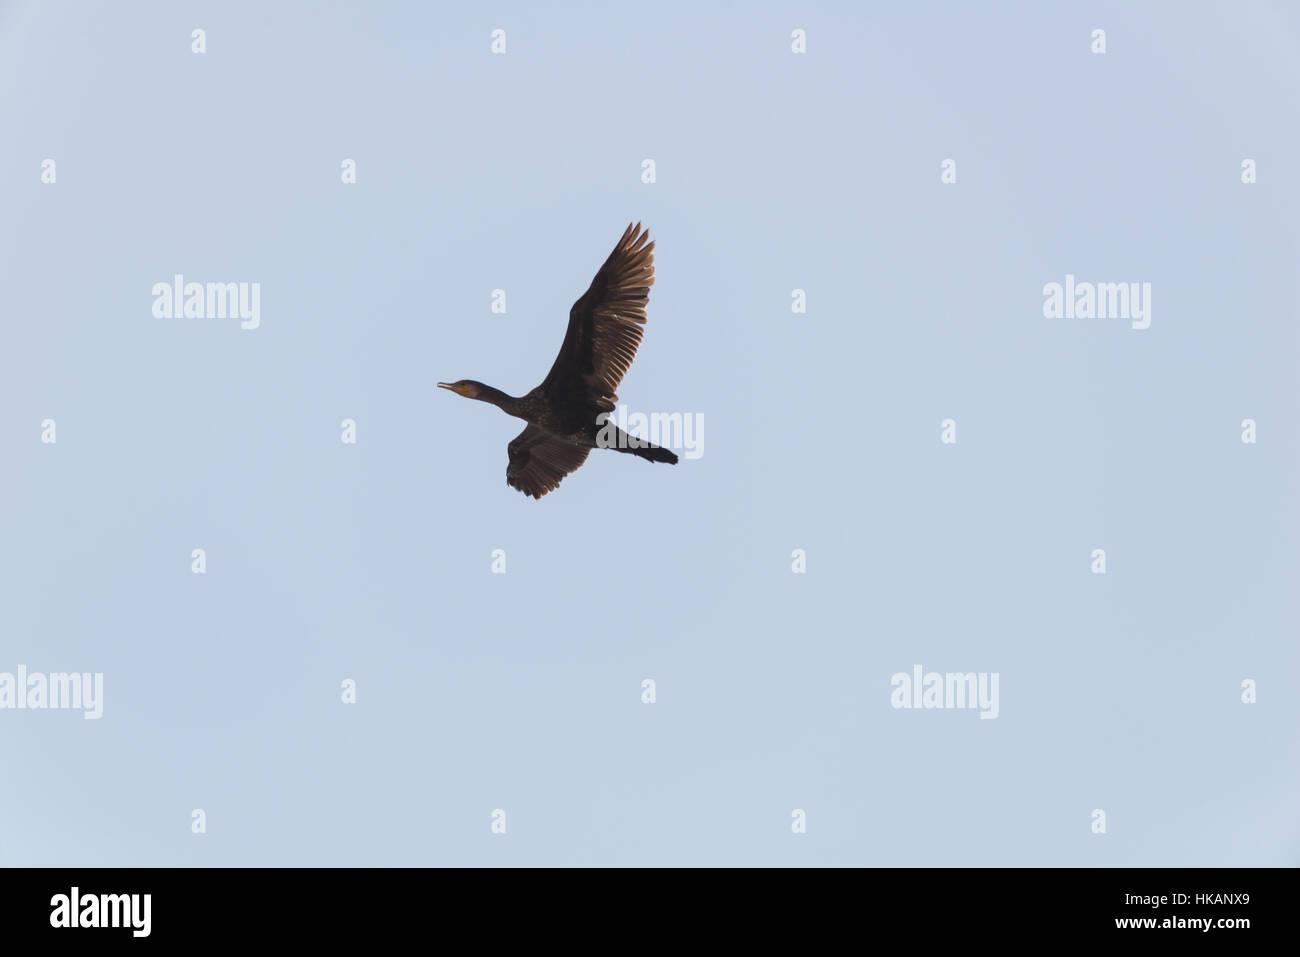 Pelican migration at Viker lookout, Israel - Stock Image